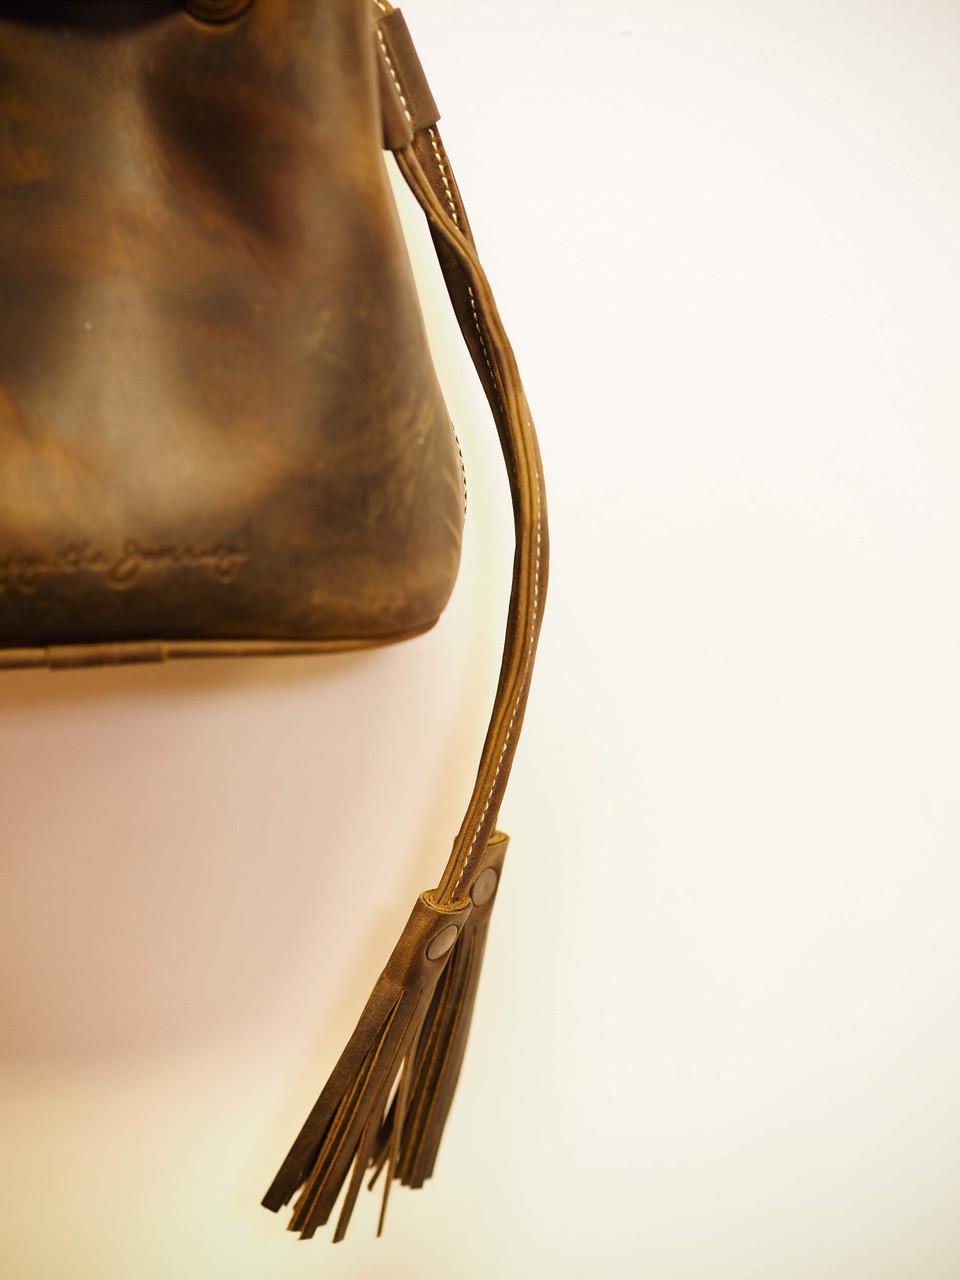 Mini Correa Bucket Bag in Chocolate